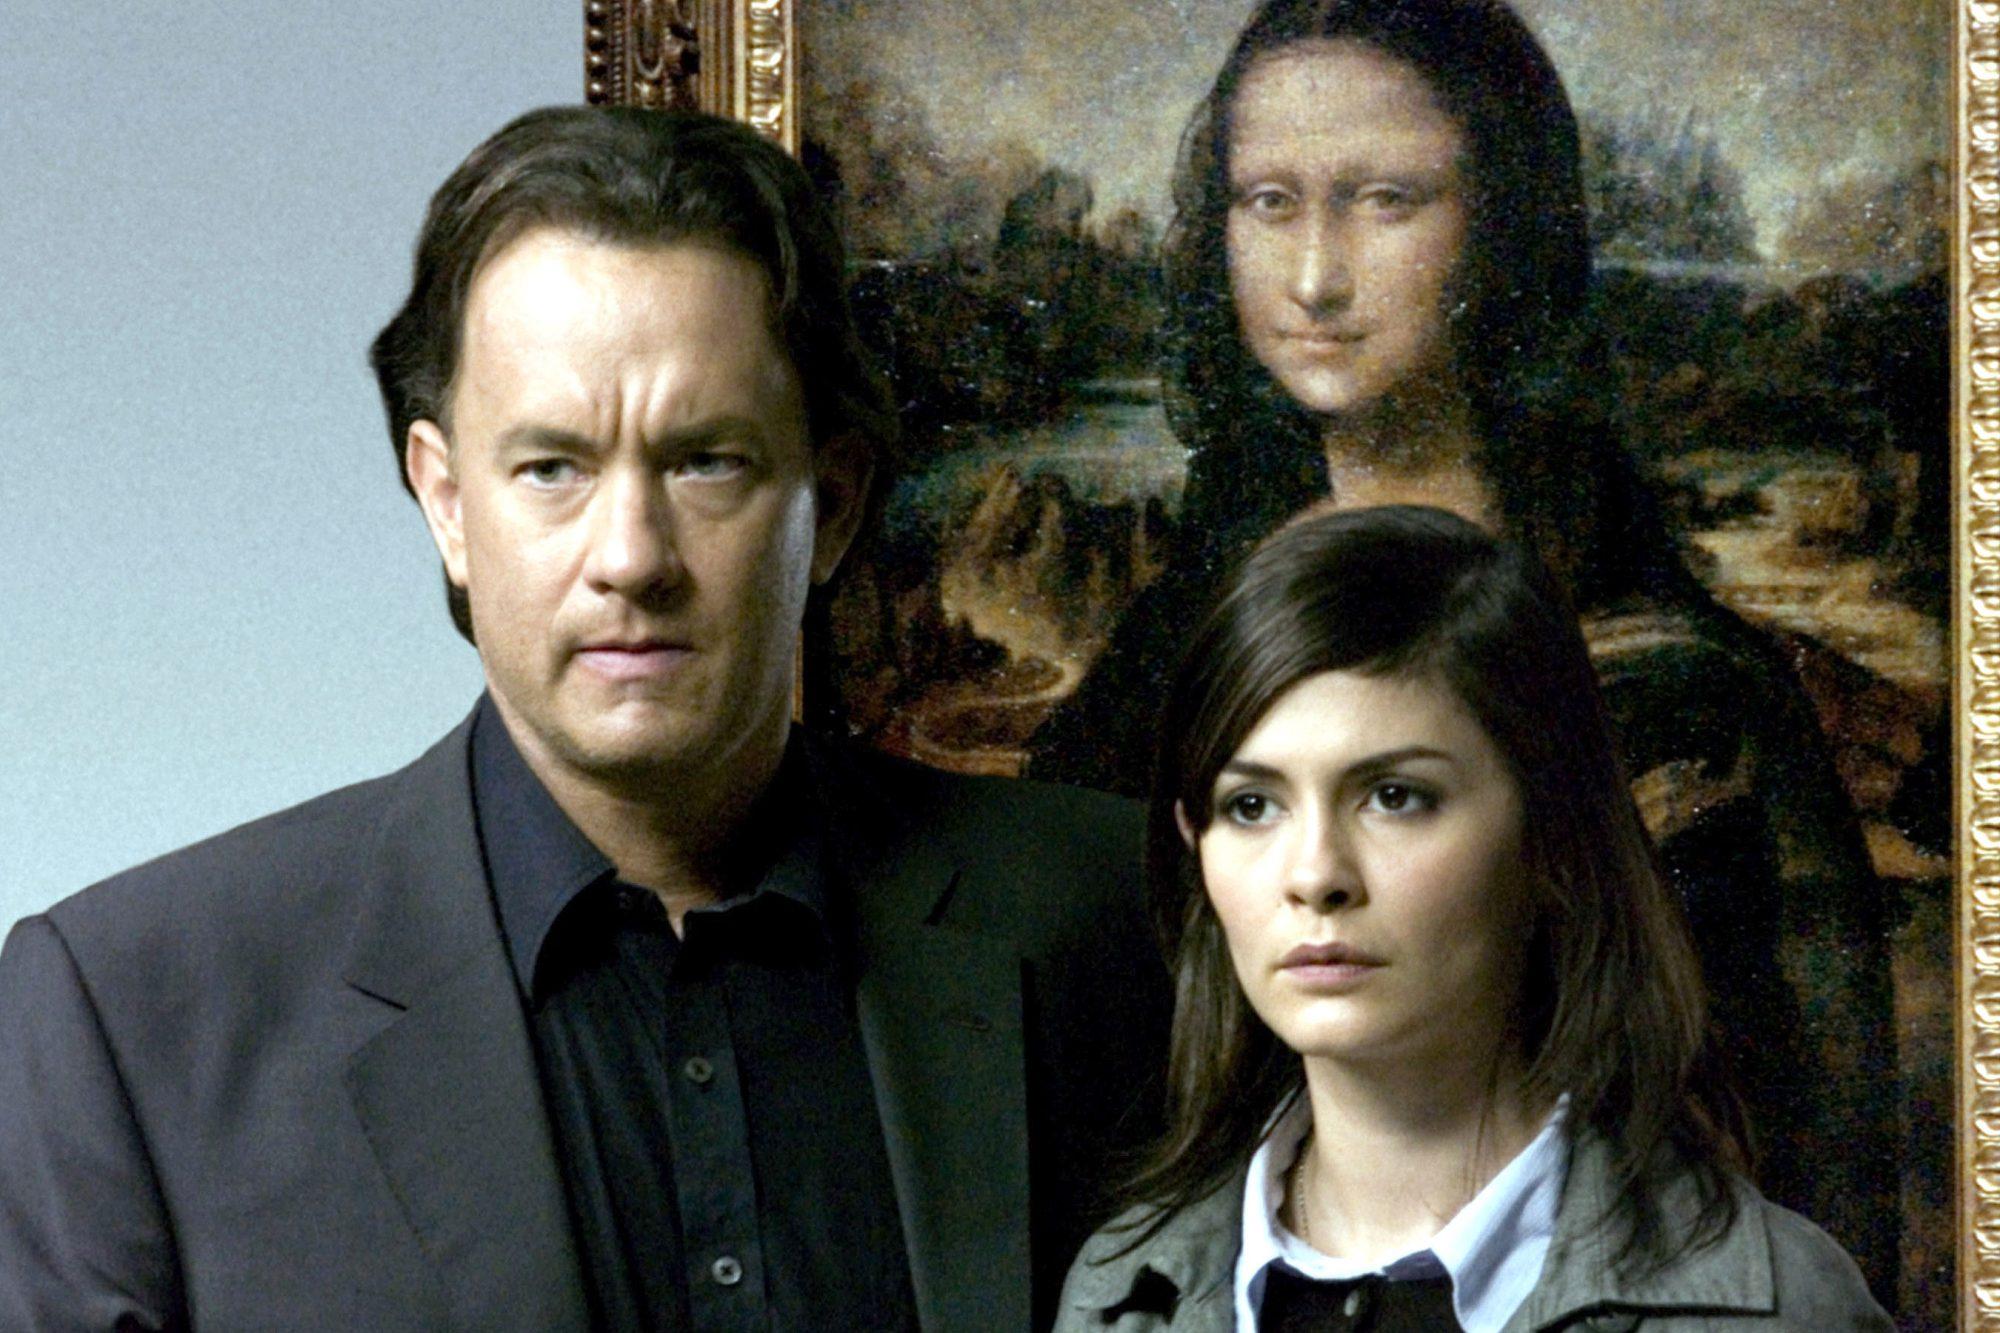 THE DA VINCI CODE, Tom Hanks, Audrey Tautou, 2006, (c)Columbia/courtesy Everett Collection